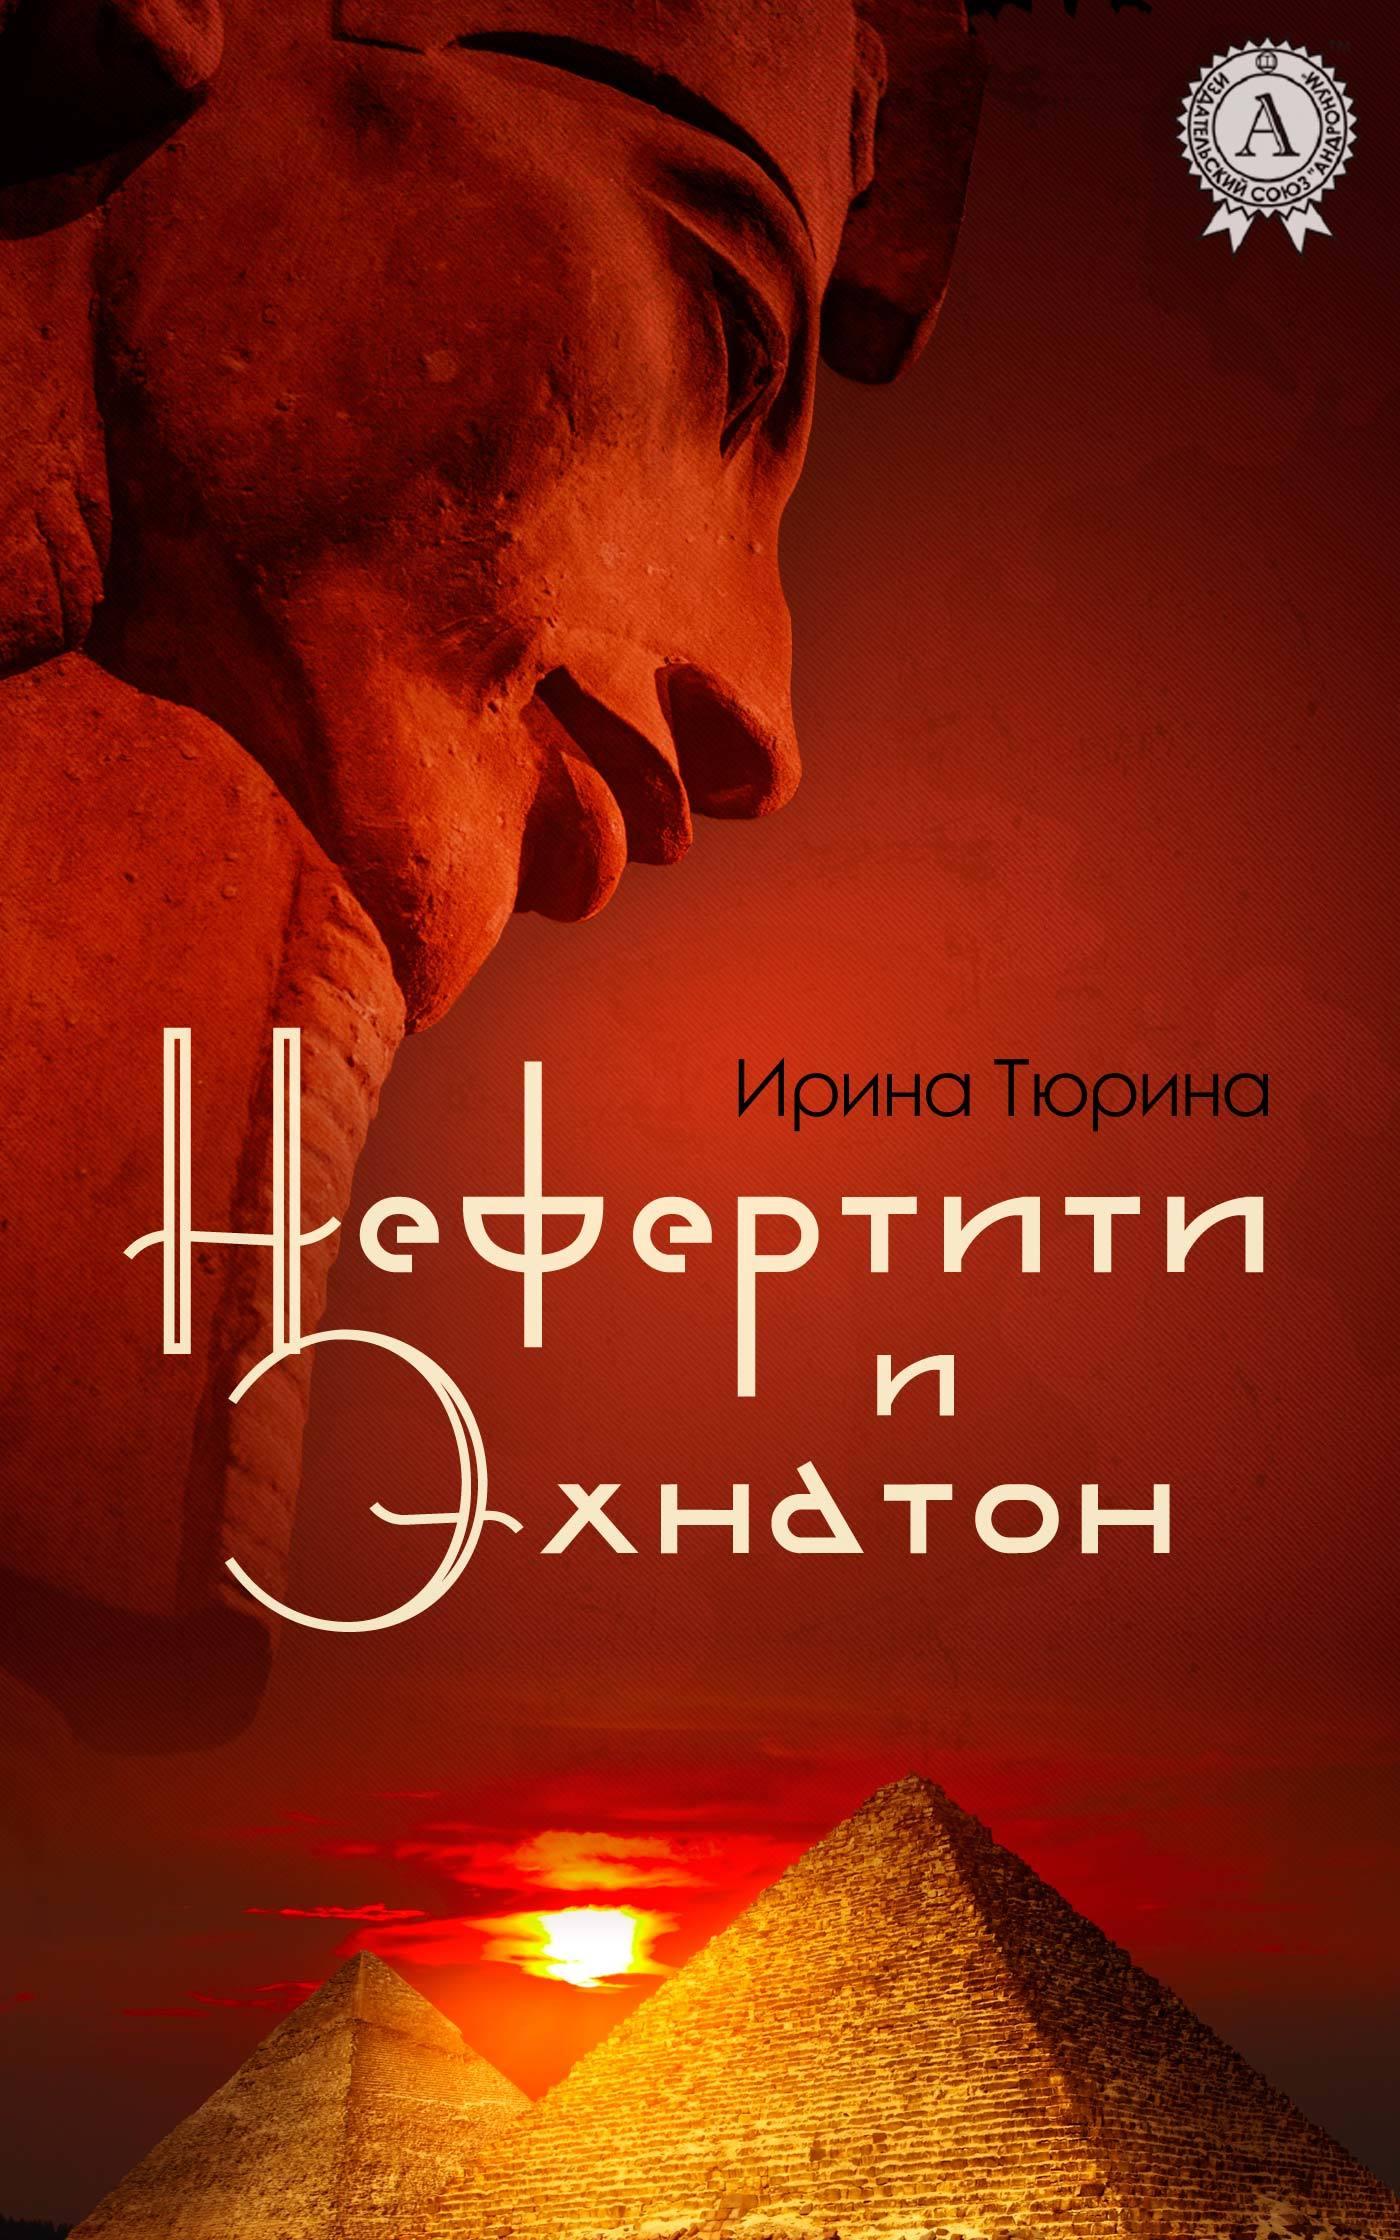 Ирина Тюрина - Нефертити и Эхнатон